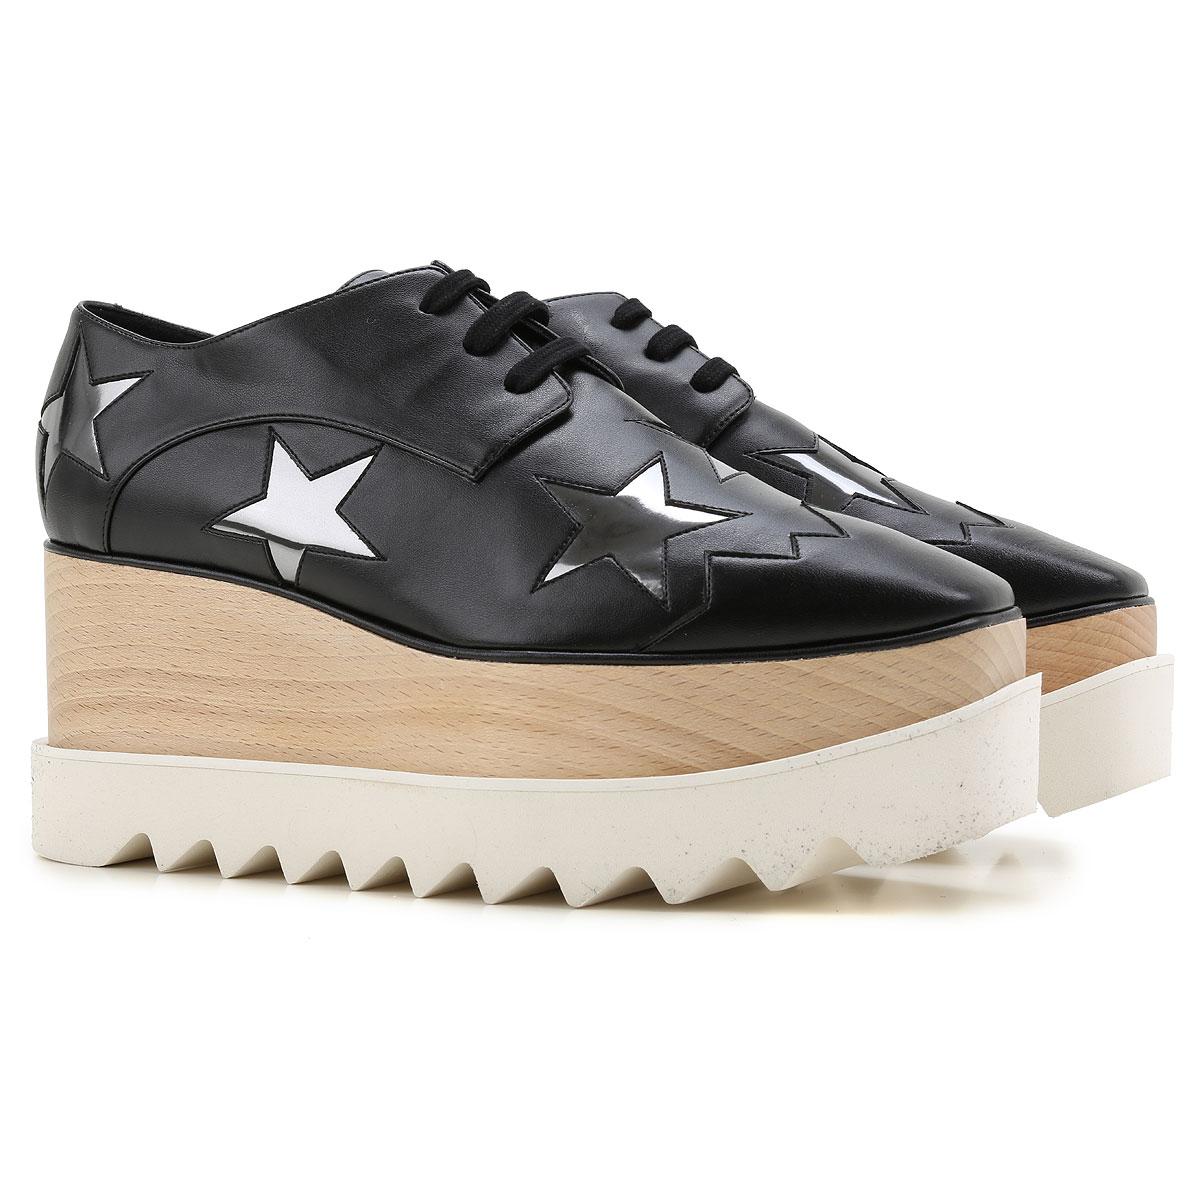 chaussures femme stella mccartney code produit 363998 w0yg6 1038. Black Bedroom Furniture Sets. Home Design Ideas